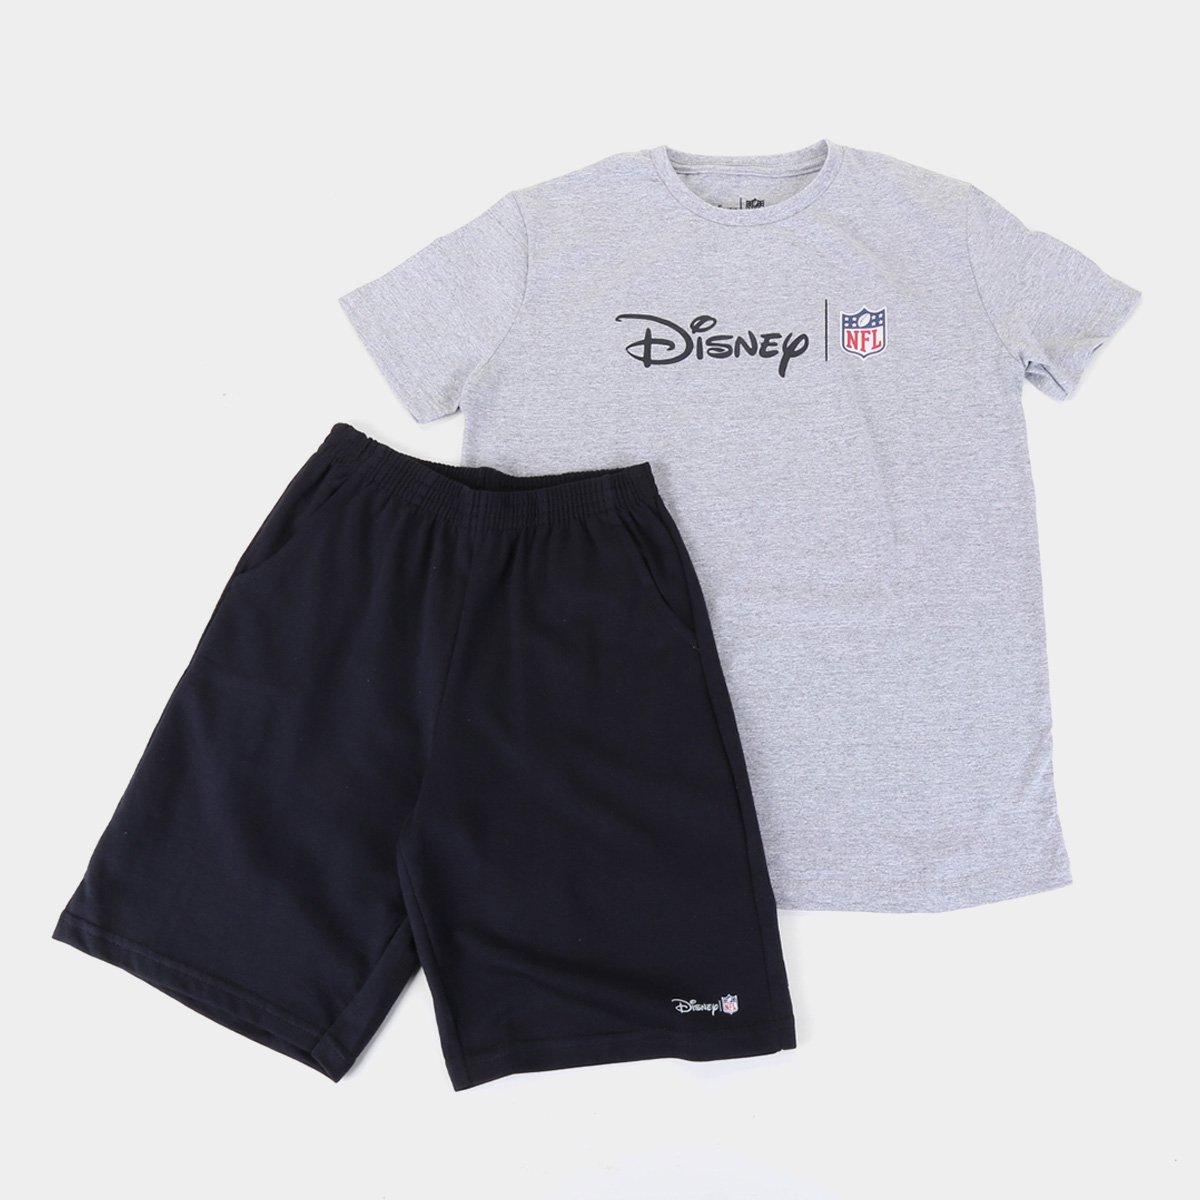 Conjunto Juvenil NFL Disney Masculino